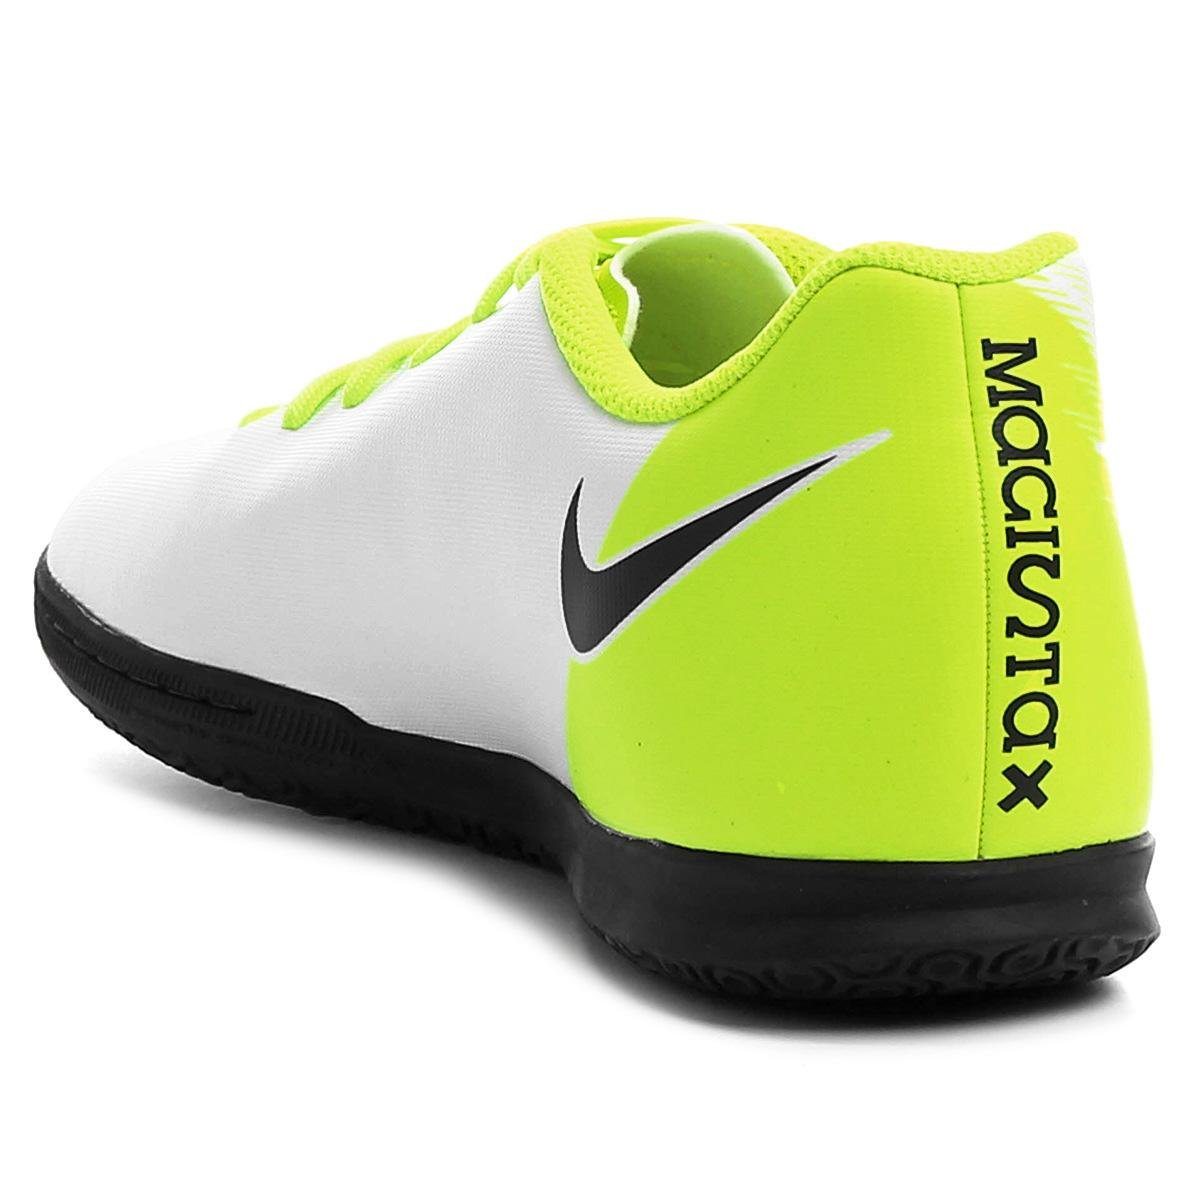 136cf28206 Chuteira Futsal Nike Magista Ola II IC Masculina - Compre Agora ...